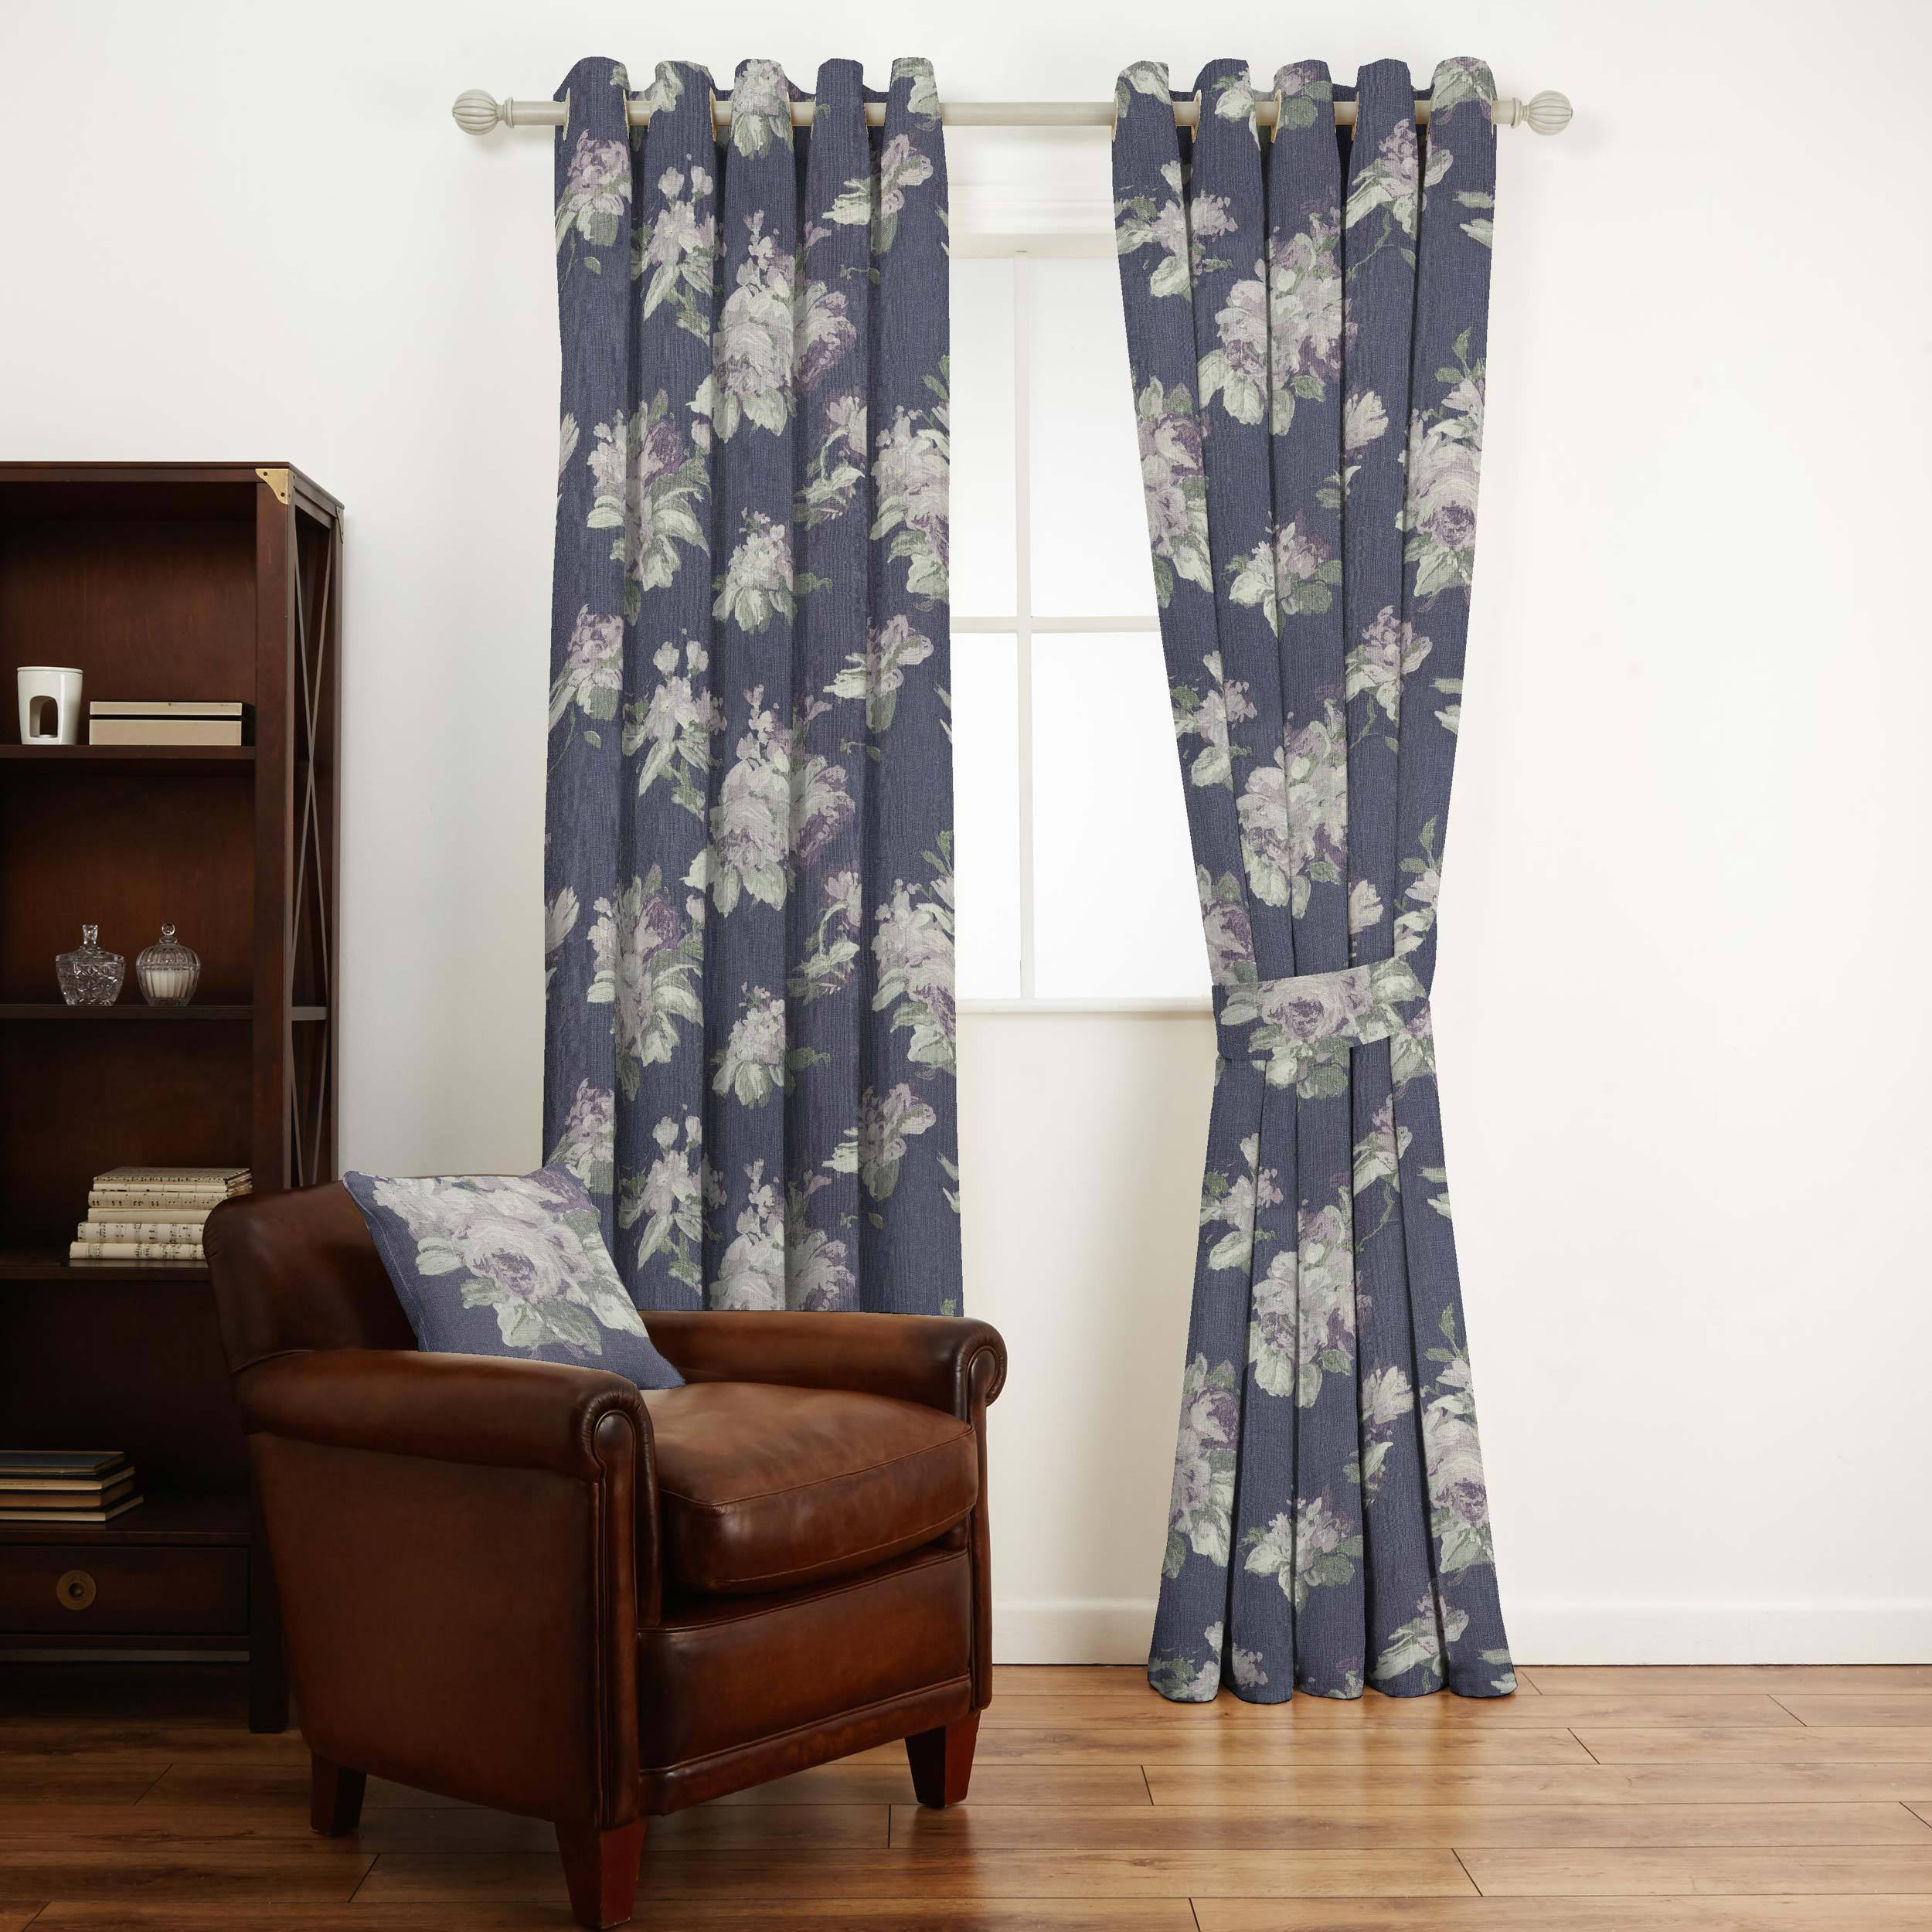 Home Furniture DIY Laura Ashley Designer Cushion Cover VIOLETTA IRIS Fabric Various Sizes Decor